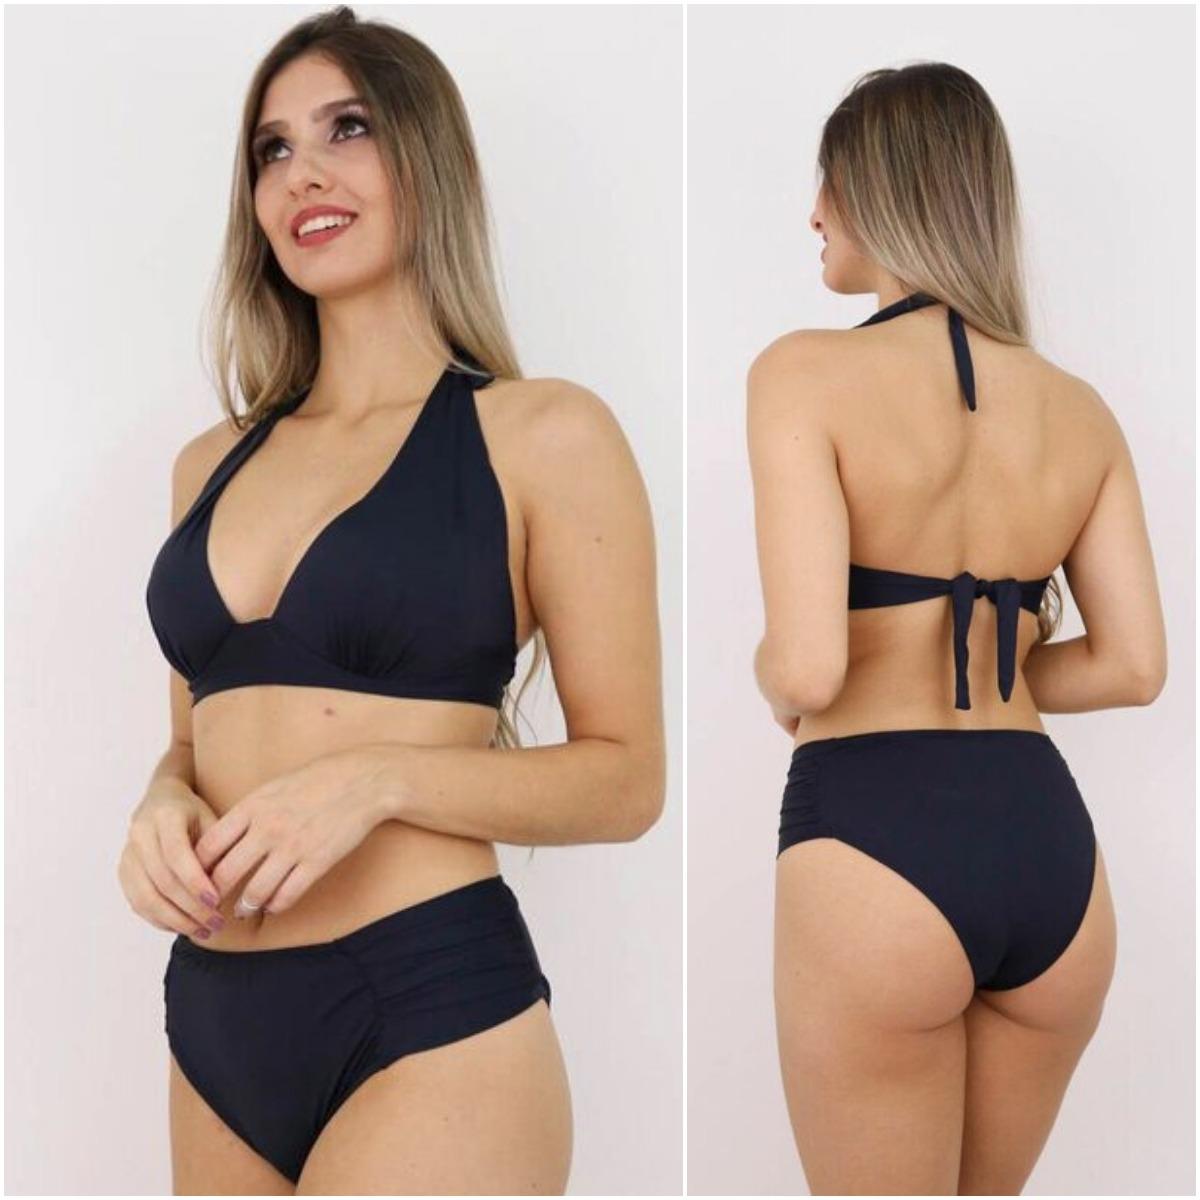 ace9320c3 biquini plus size cintura alta hot pant (calcinha) b22 2019. Carregando zoom .